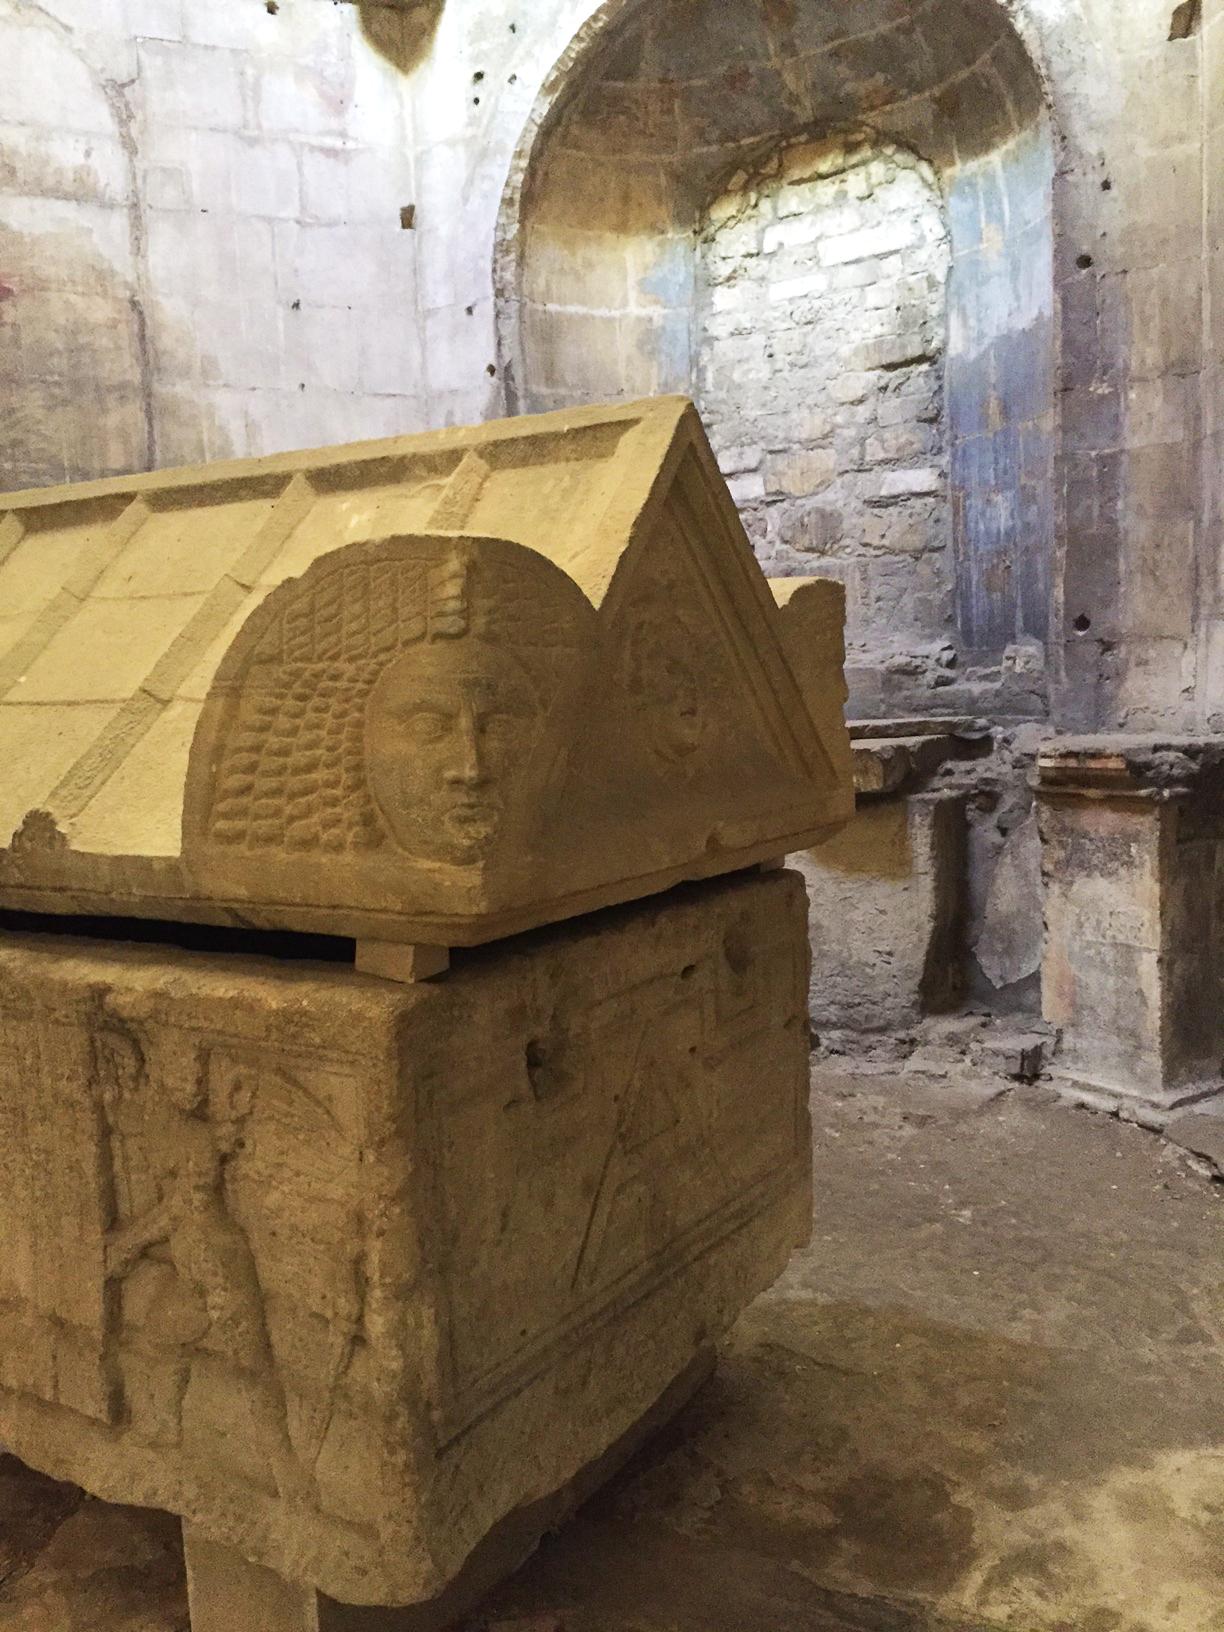 Carved sarcophagus inside Saint-Honorat